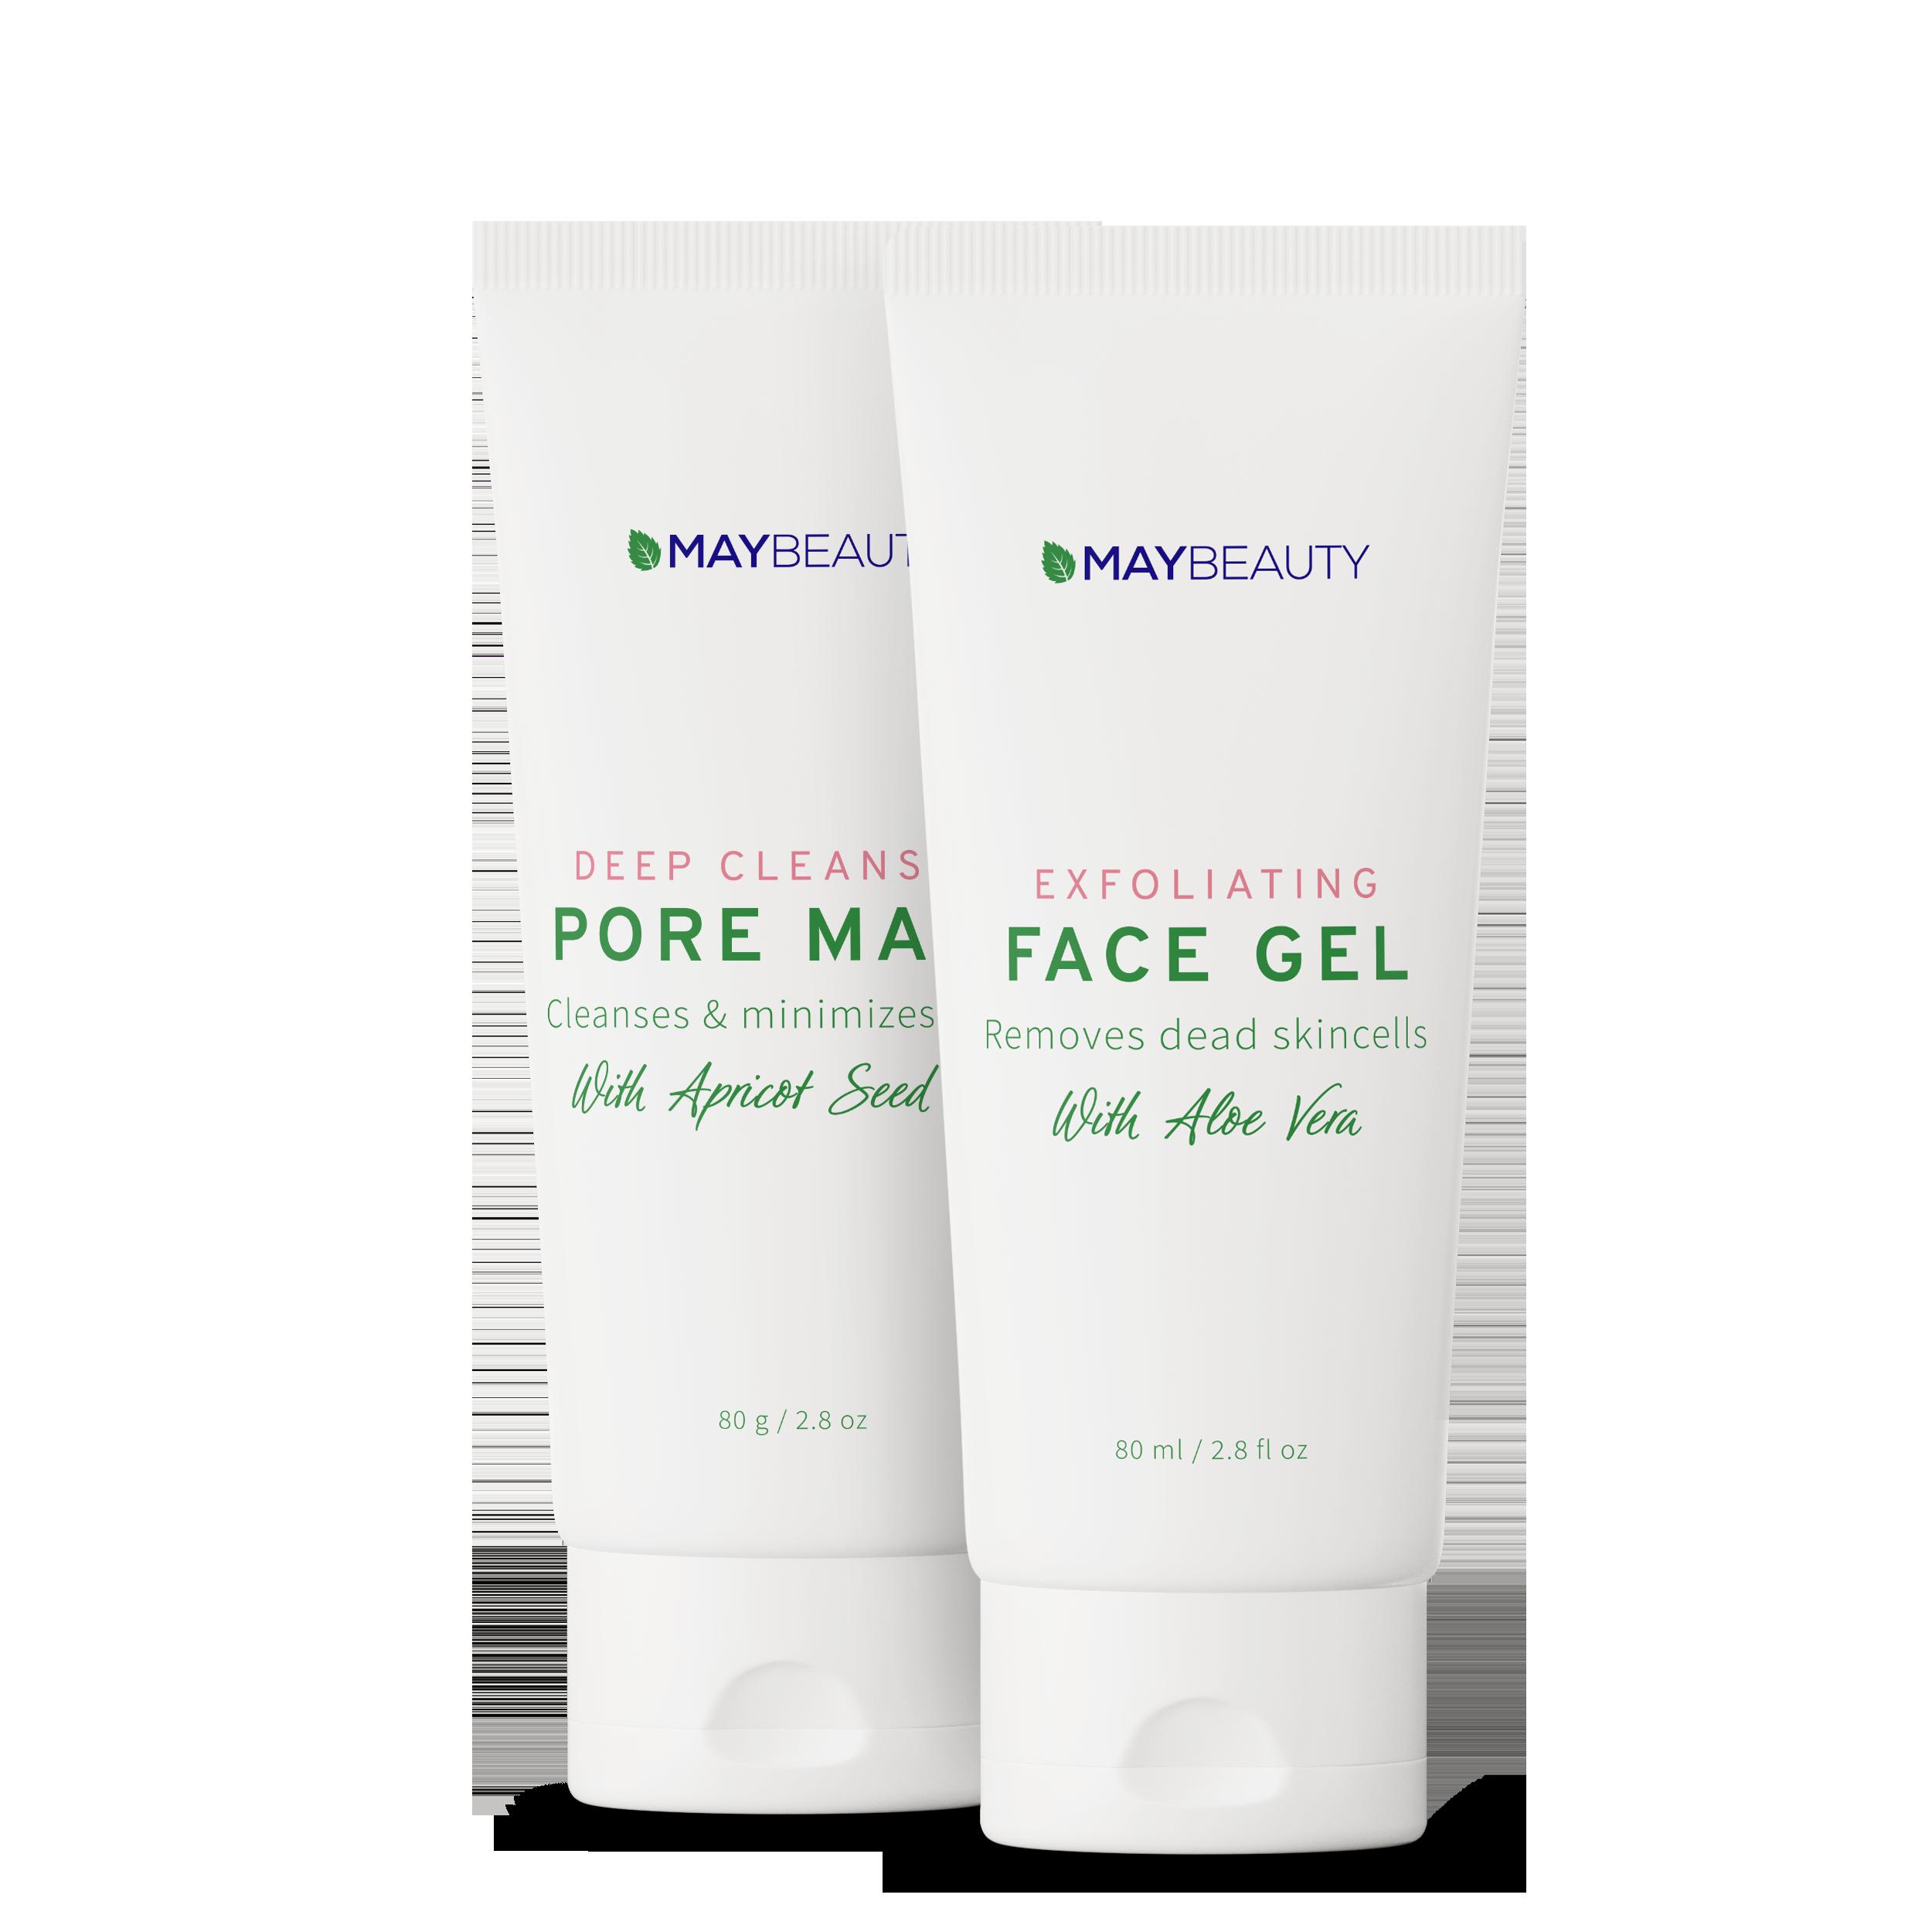 New Face Gel & Pore Mask